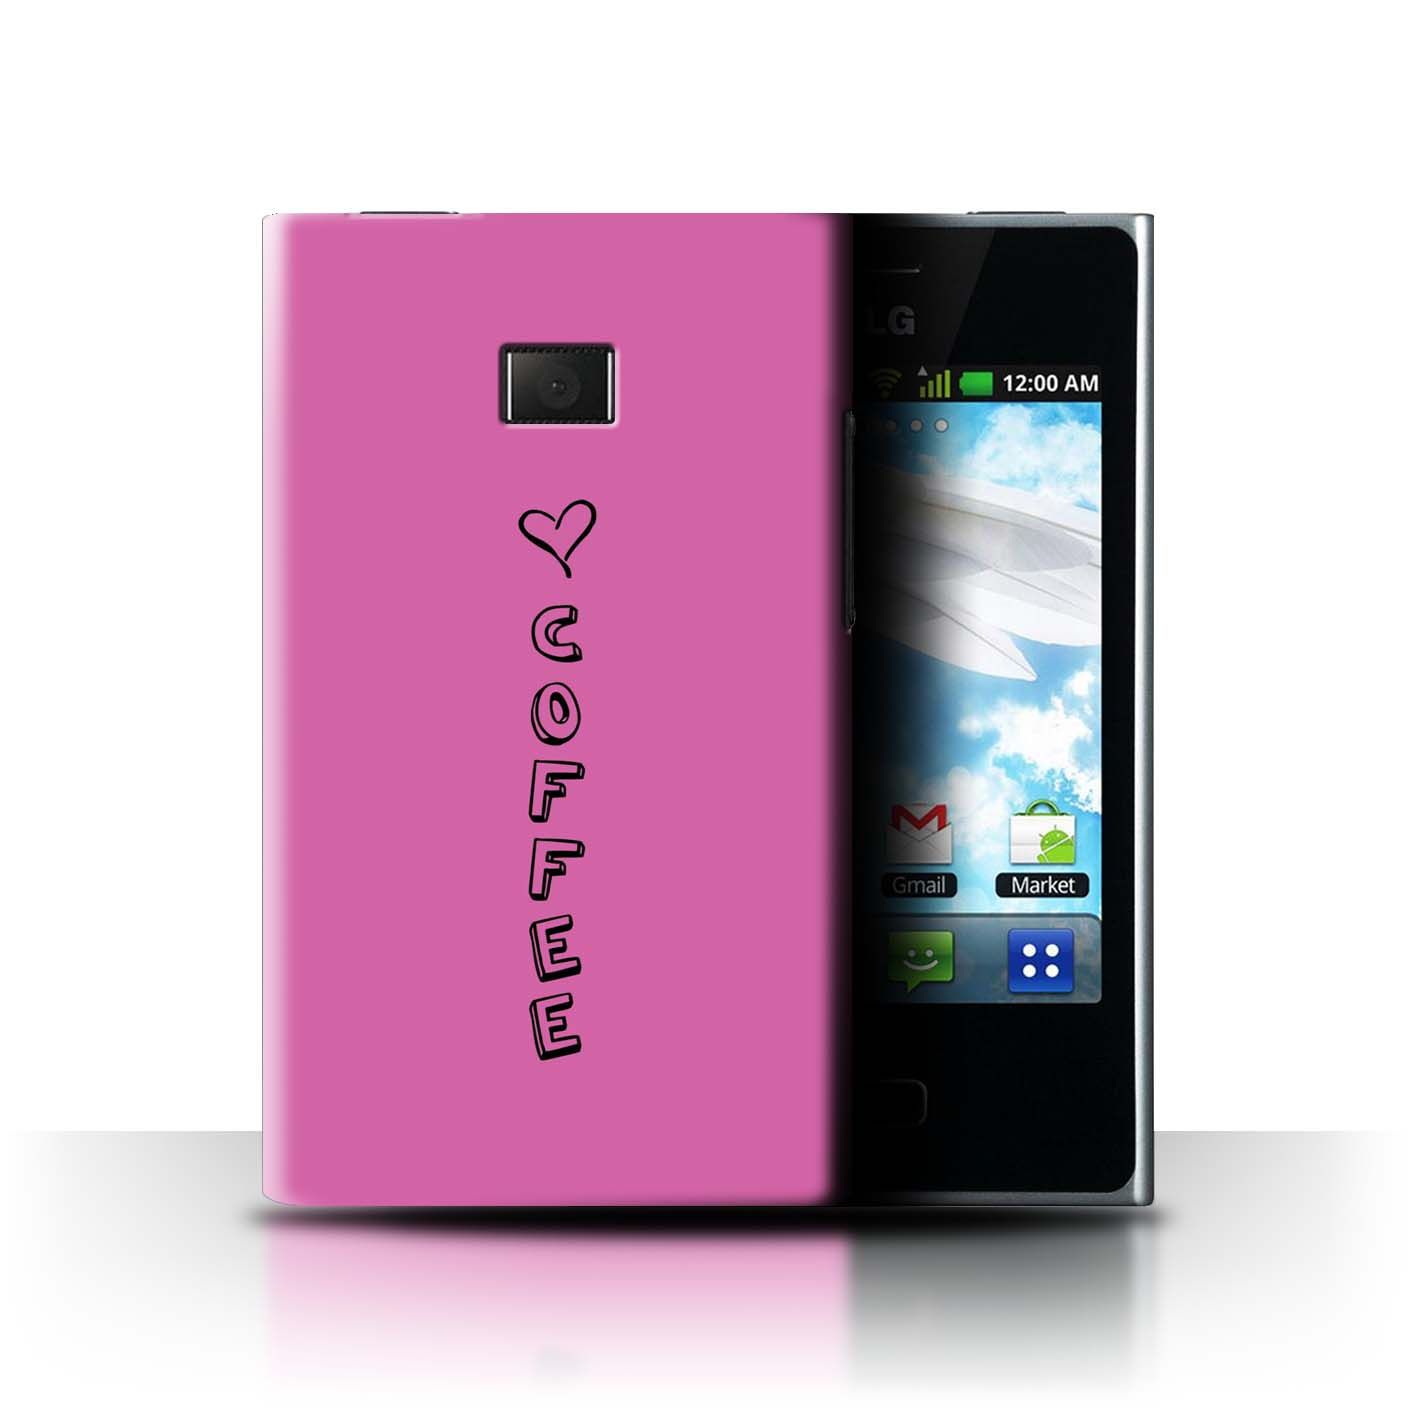 Stuff 4 teléfono caso/cubierta trasera para LG Optimus L3 E400/Corazón Xoxo